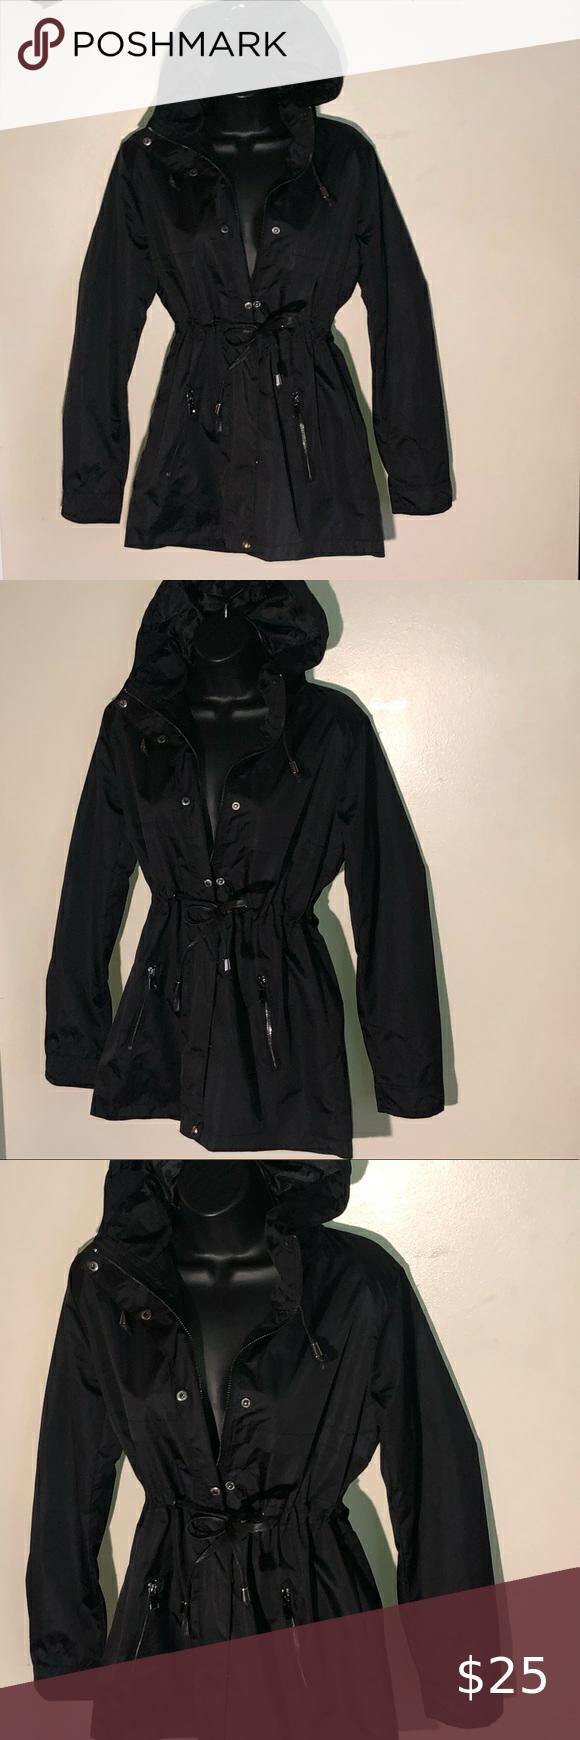 Ambiance Outerwear Black Lightweight Jacket Lightweight Jacket Clothes Design Jackets [ 1740 x 580 Pixel ]